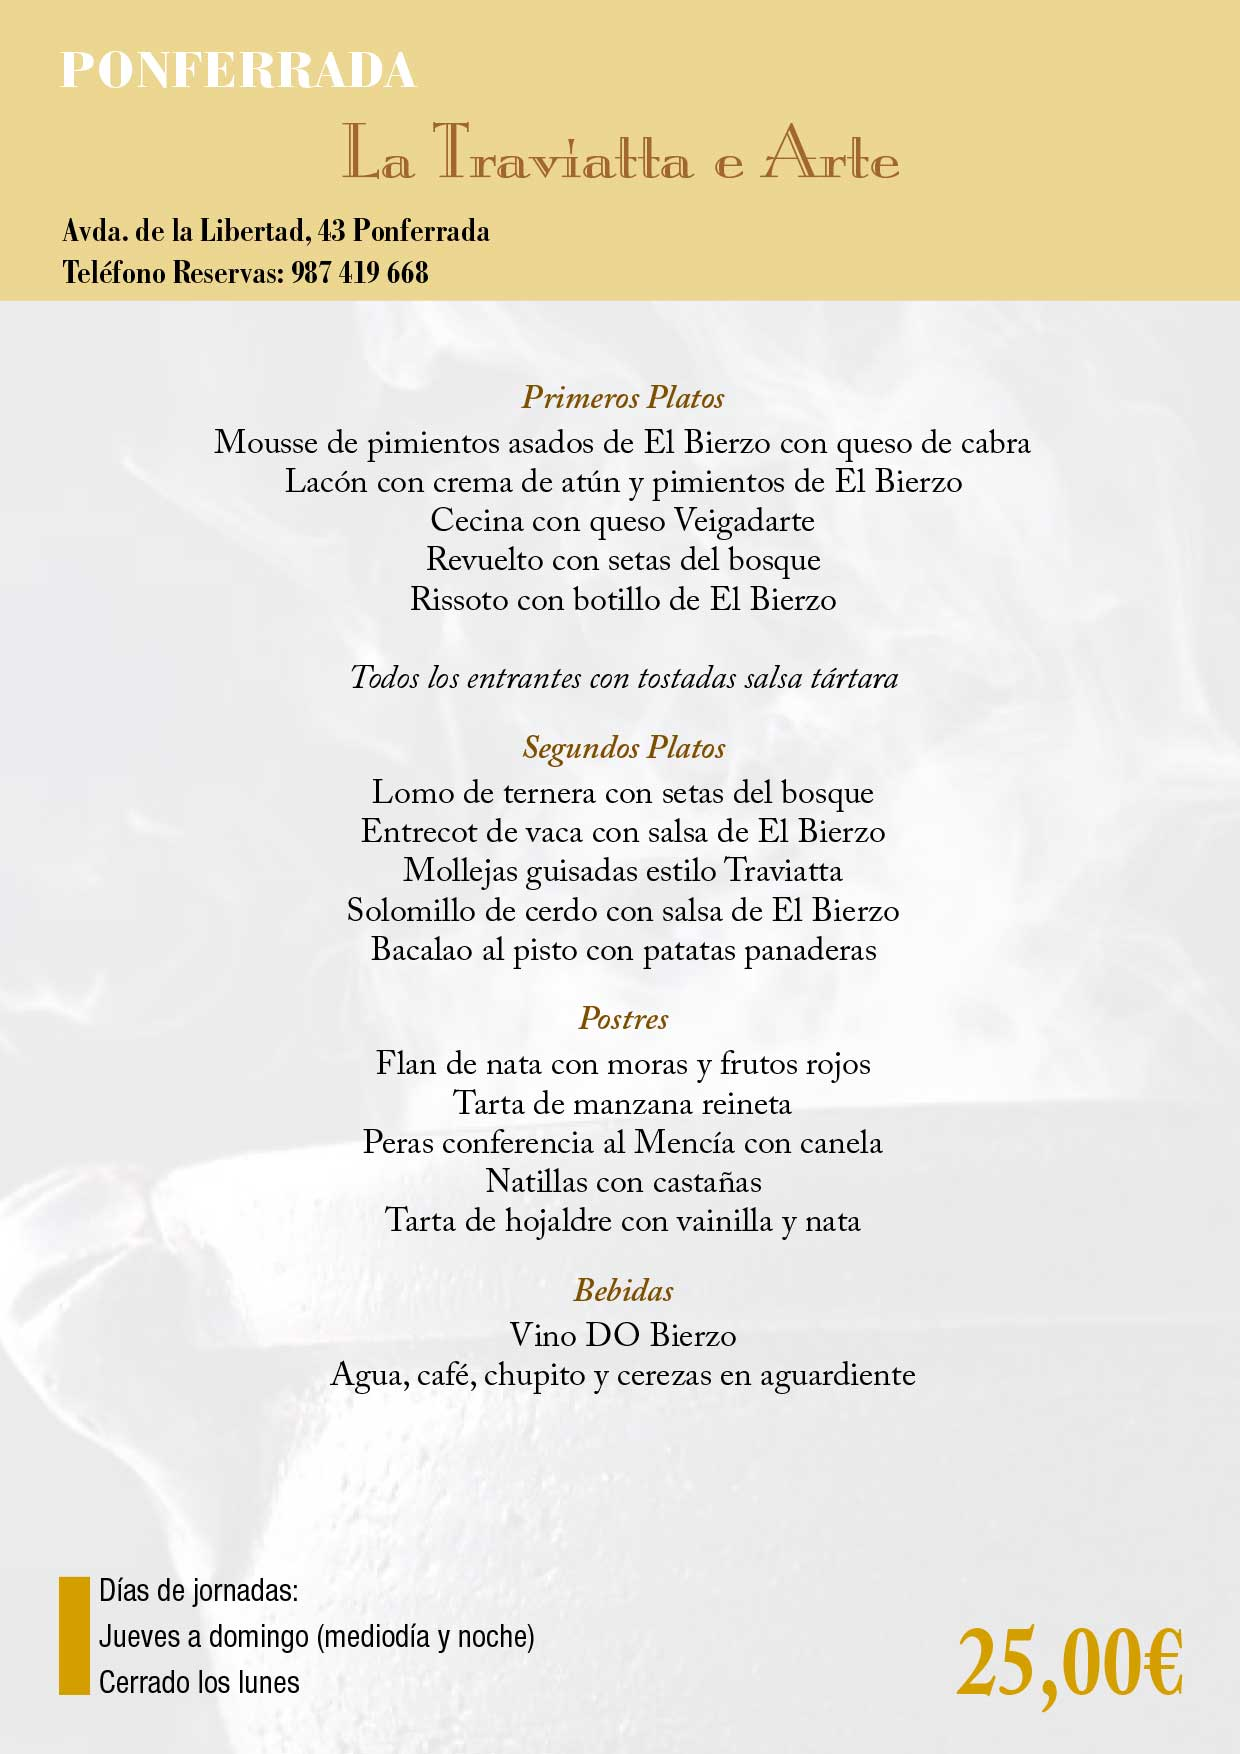 XXXIII Jornadas gastronómicas del Bierzo 2017. Restaurantes participantes 26